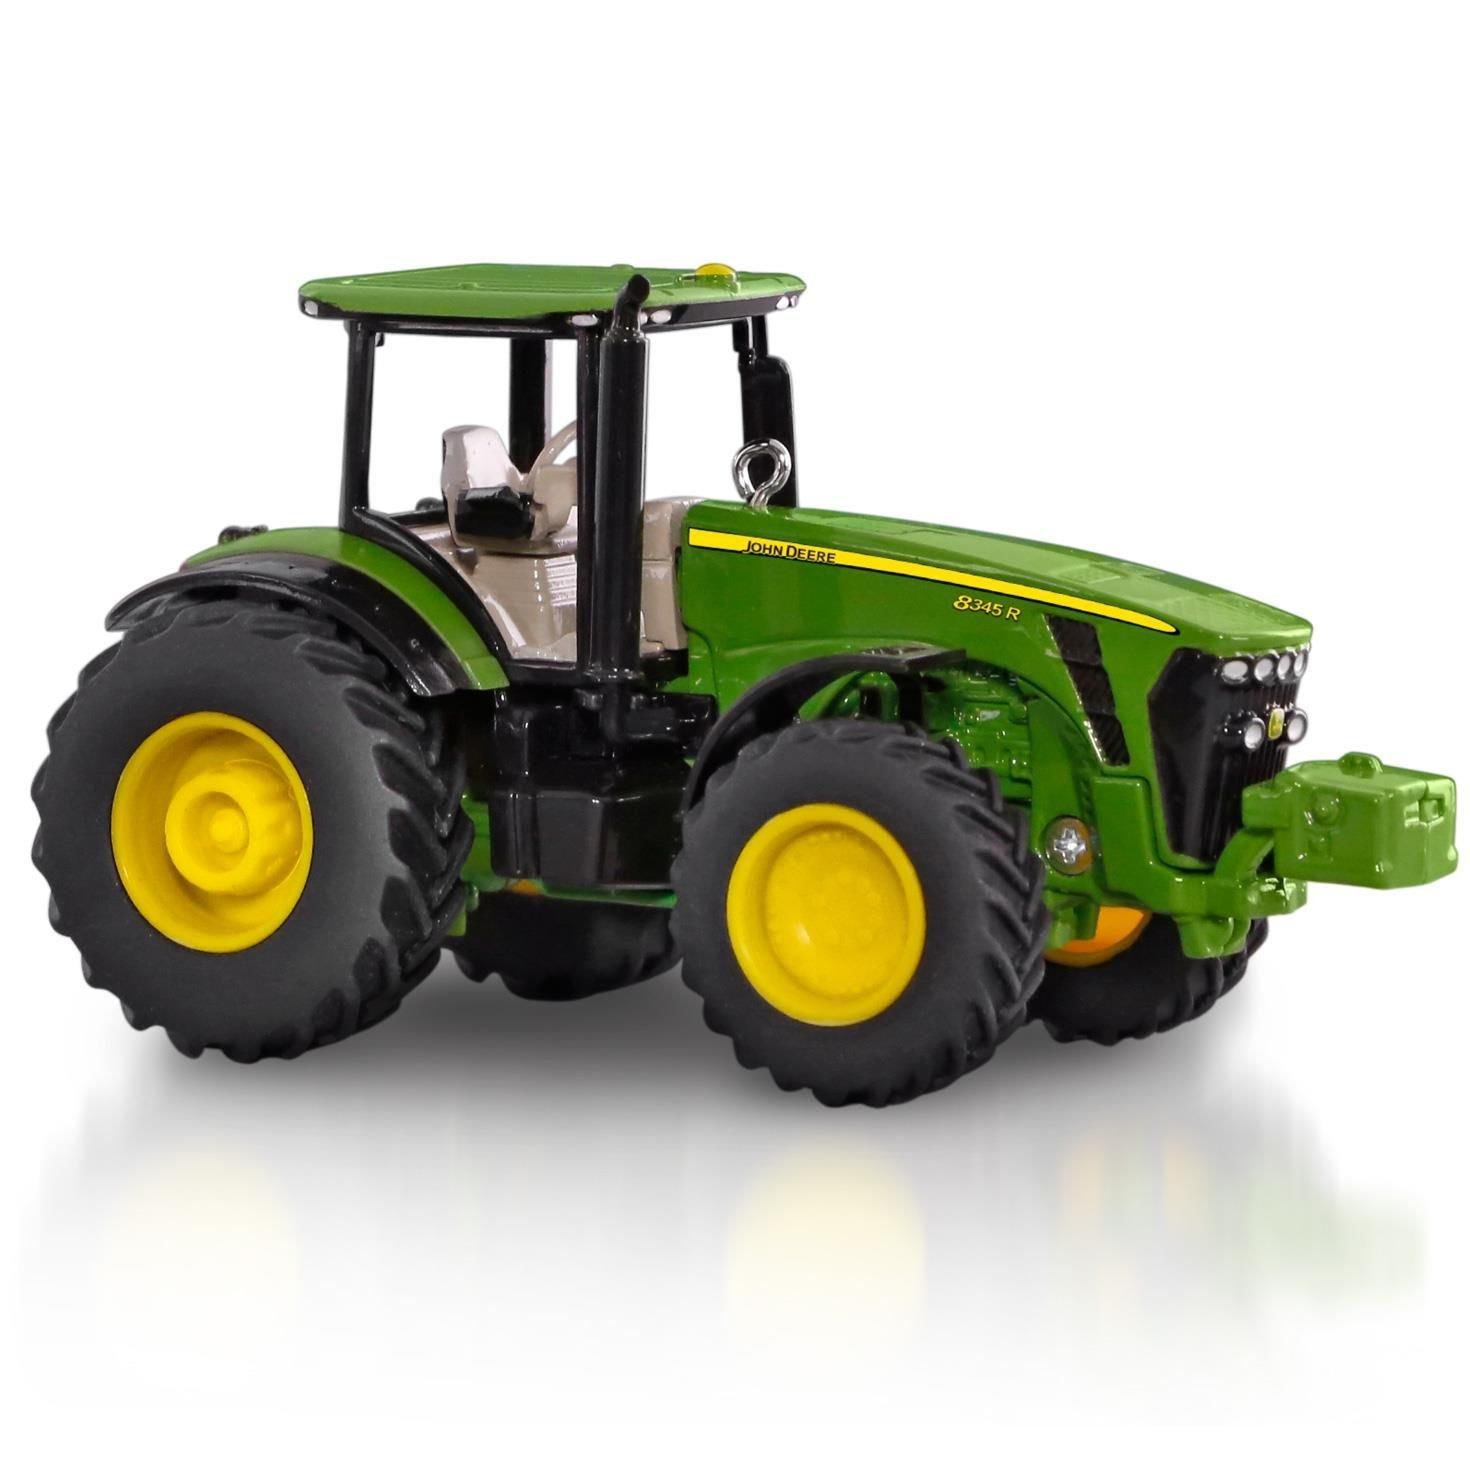 Amazon.com: John Deere 8345R Tractor Ornament 2015 Hallmark: Home ...